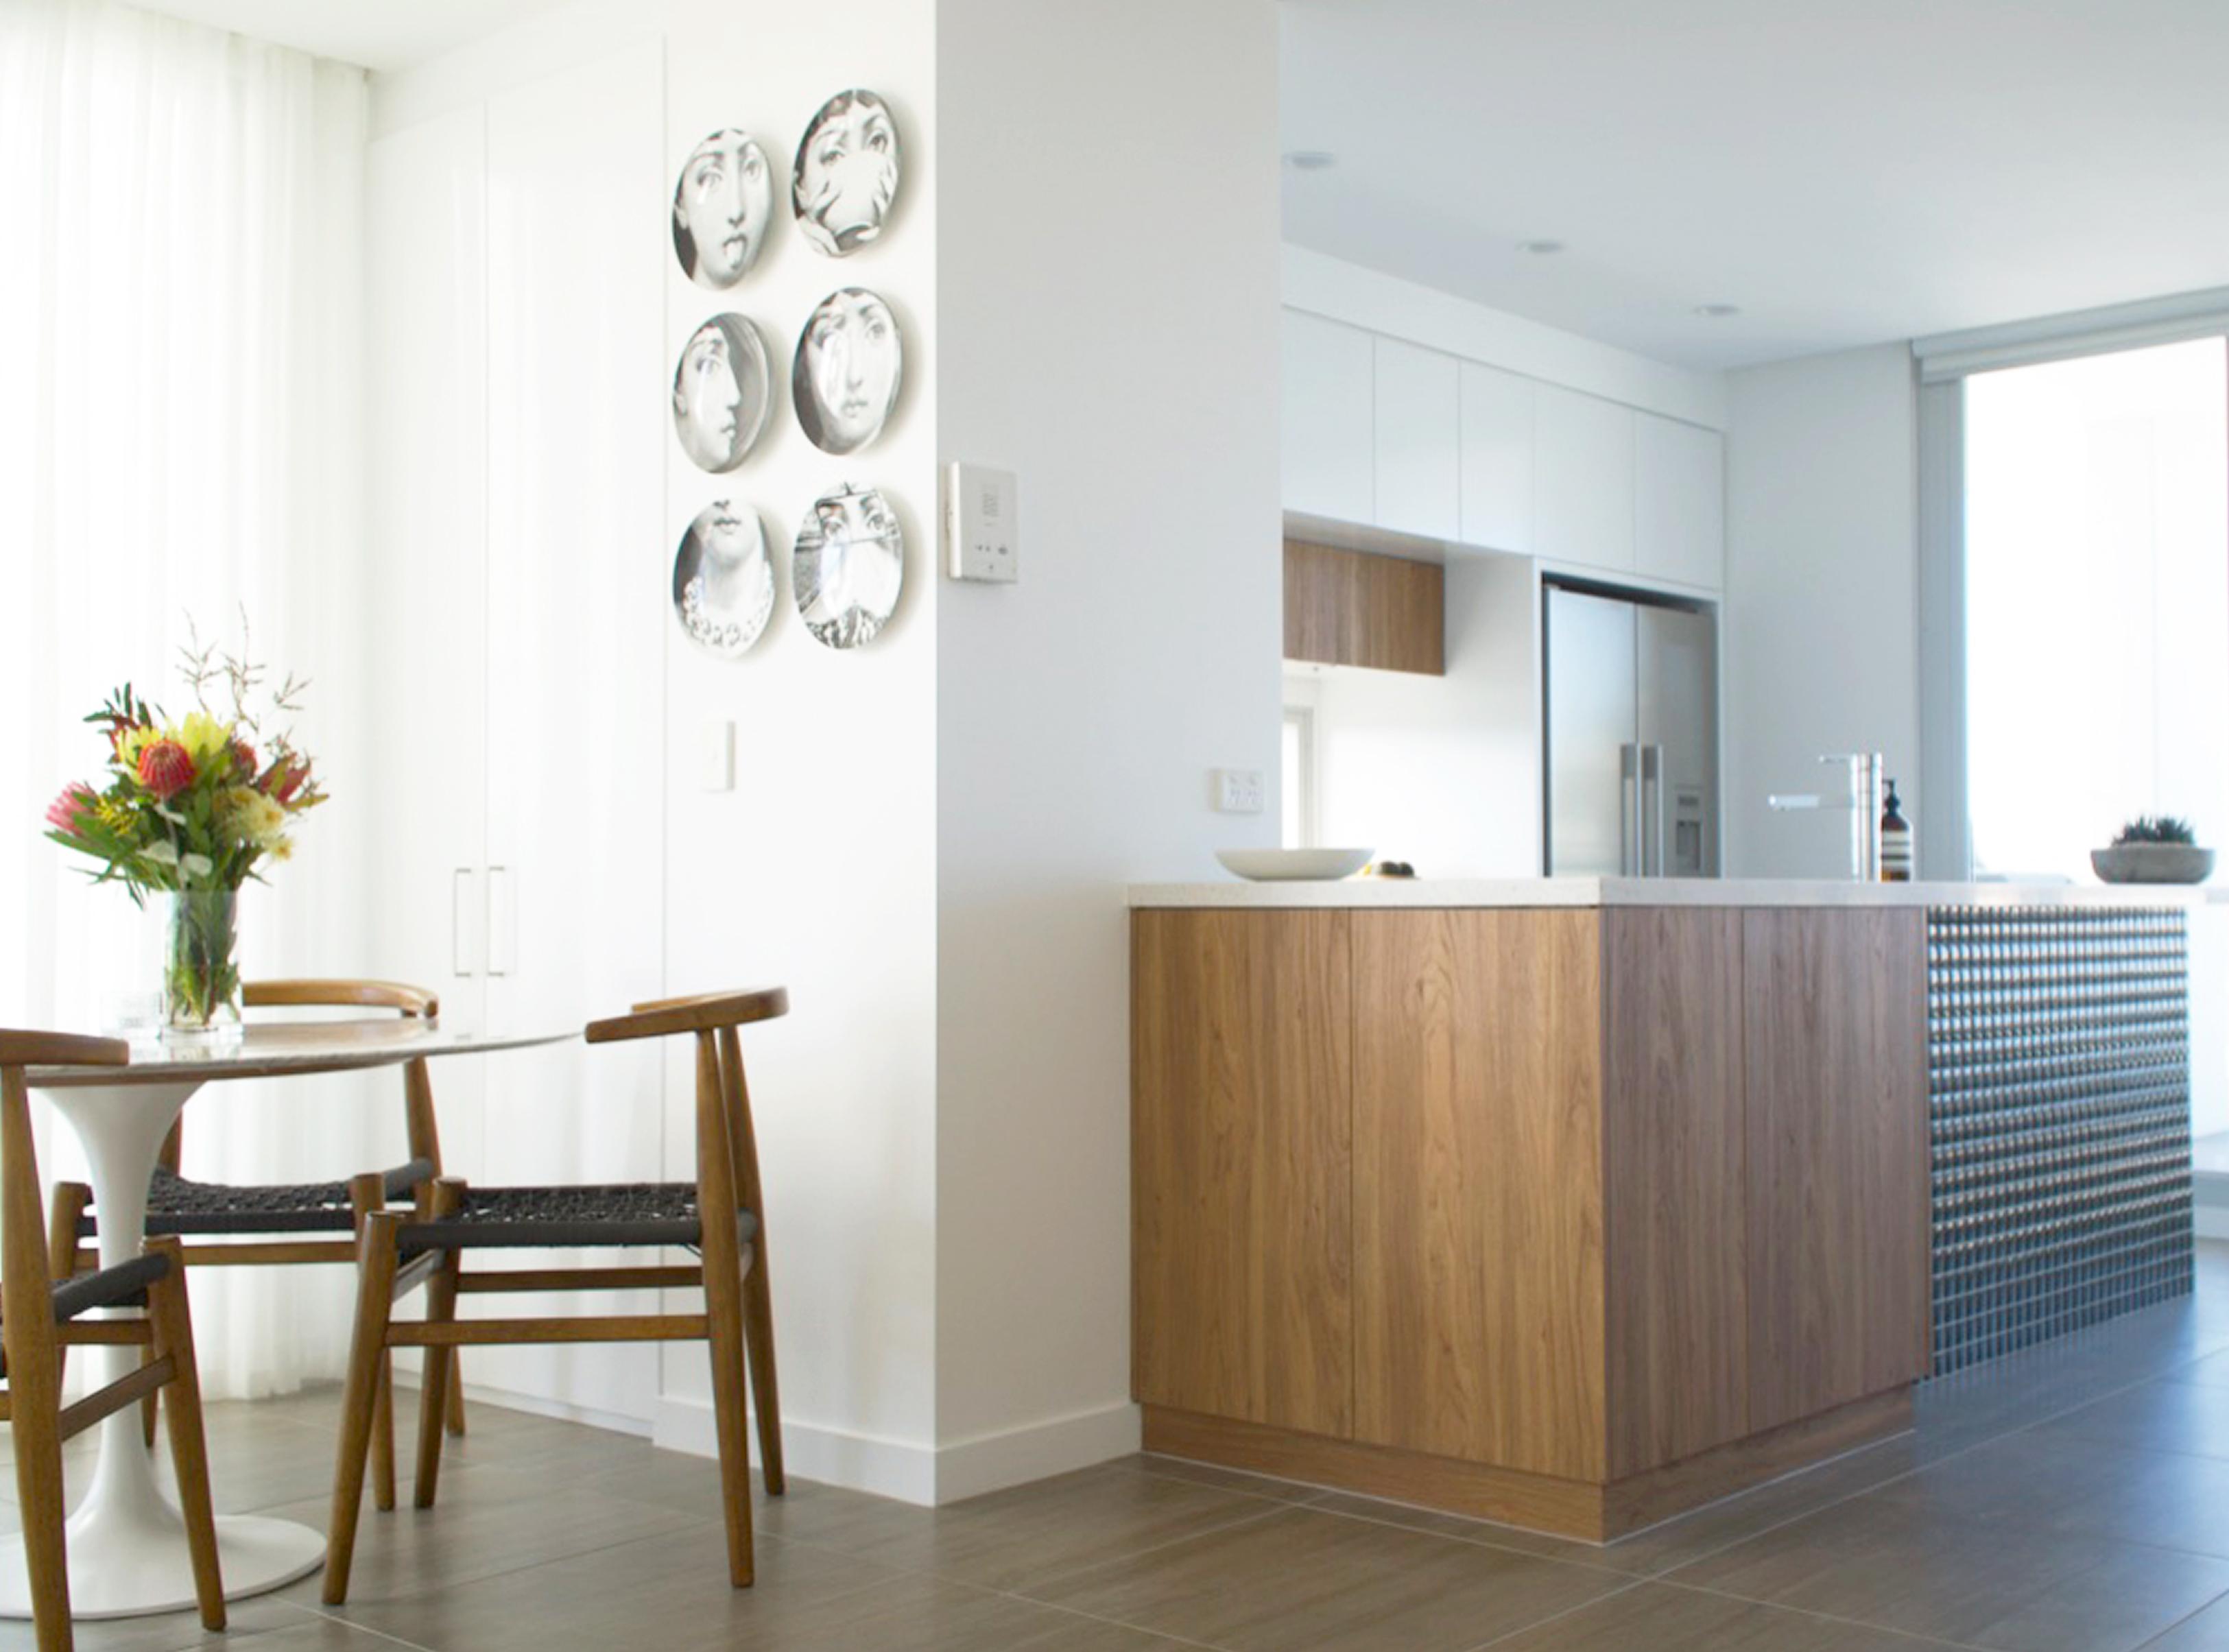 Brisbane custom joinery design, DbyD, kitchen renovation, feature tiles